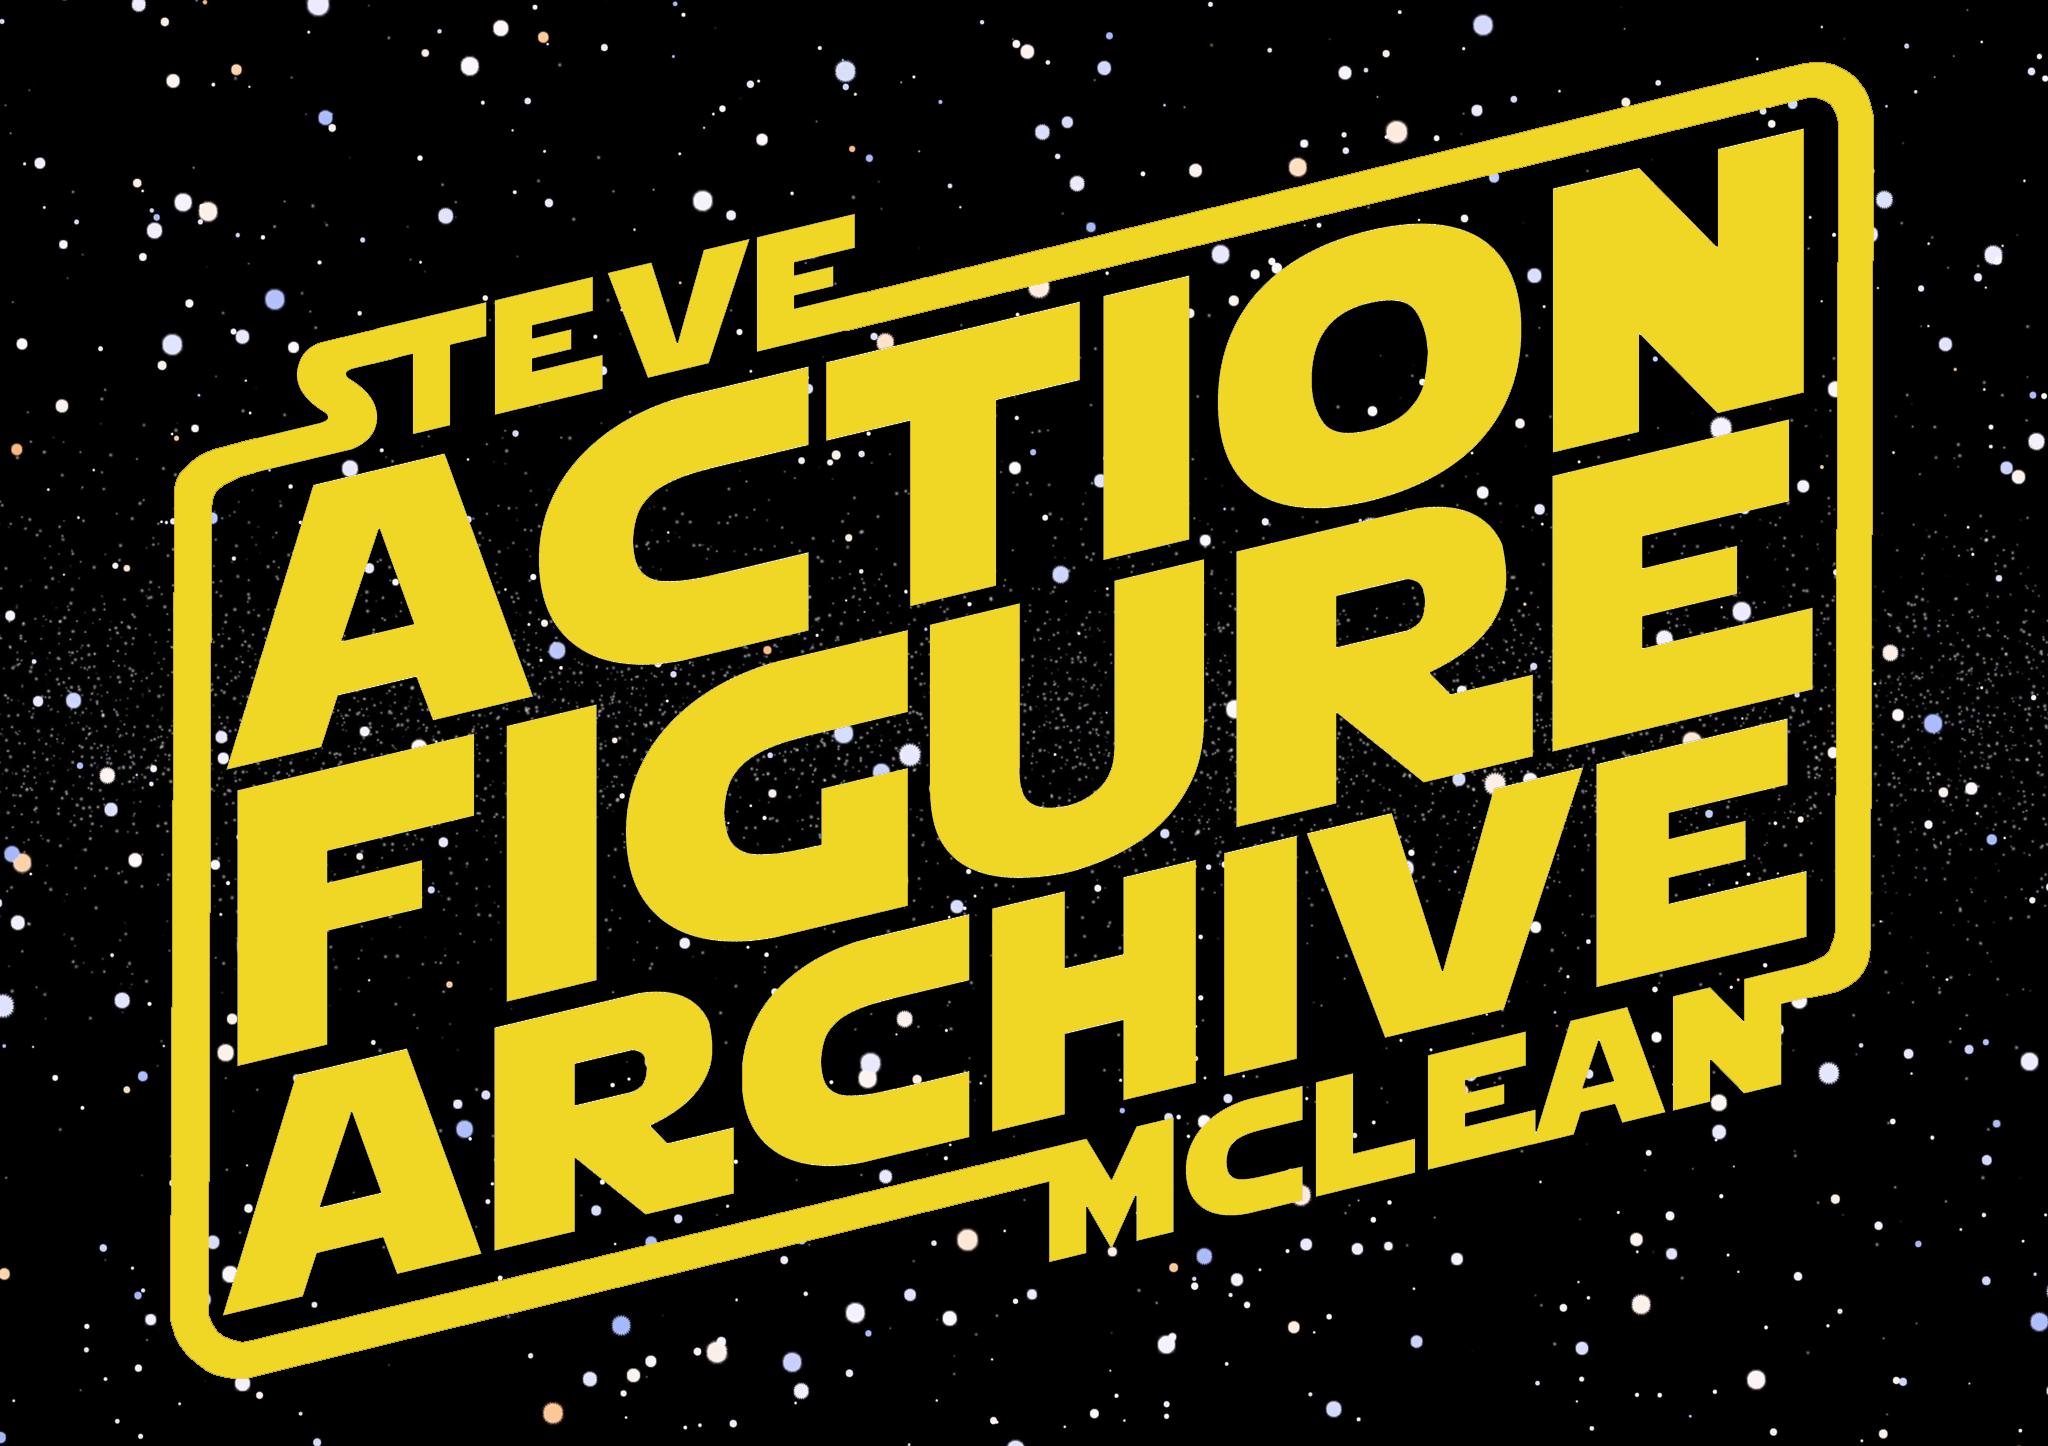 Action figure logo starfield big